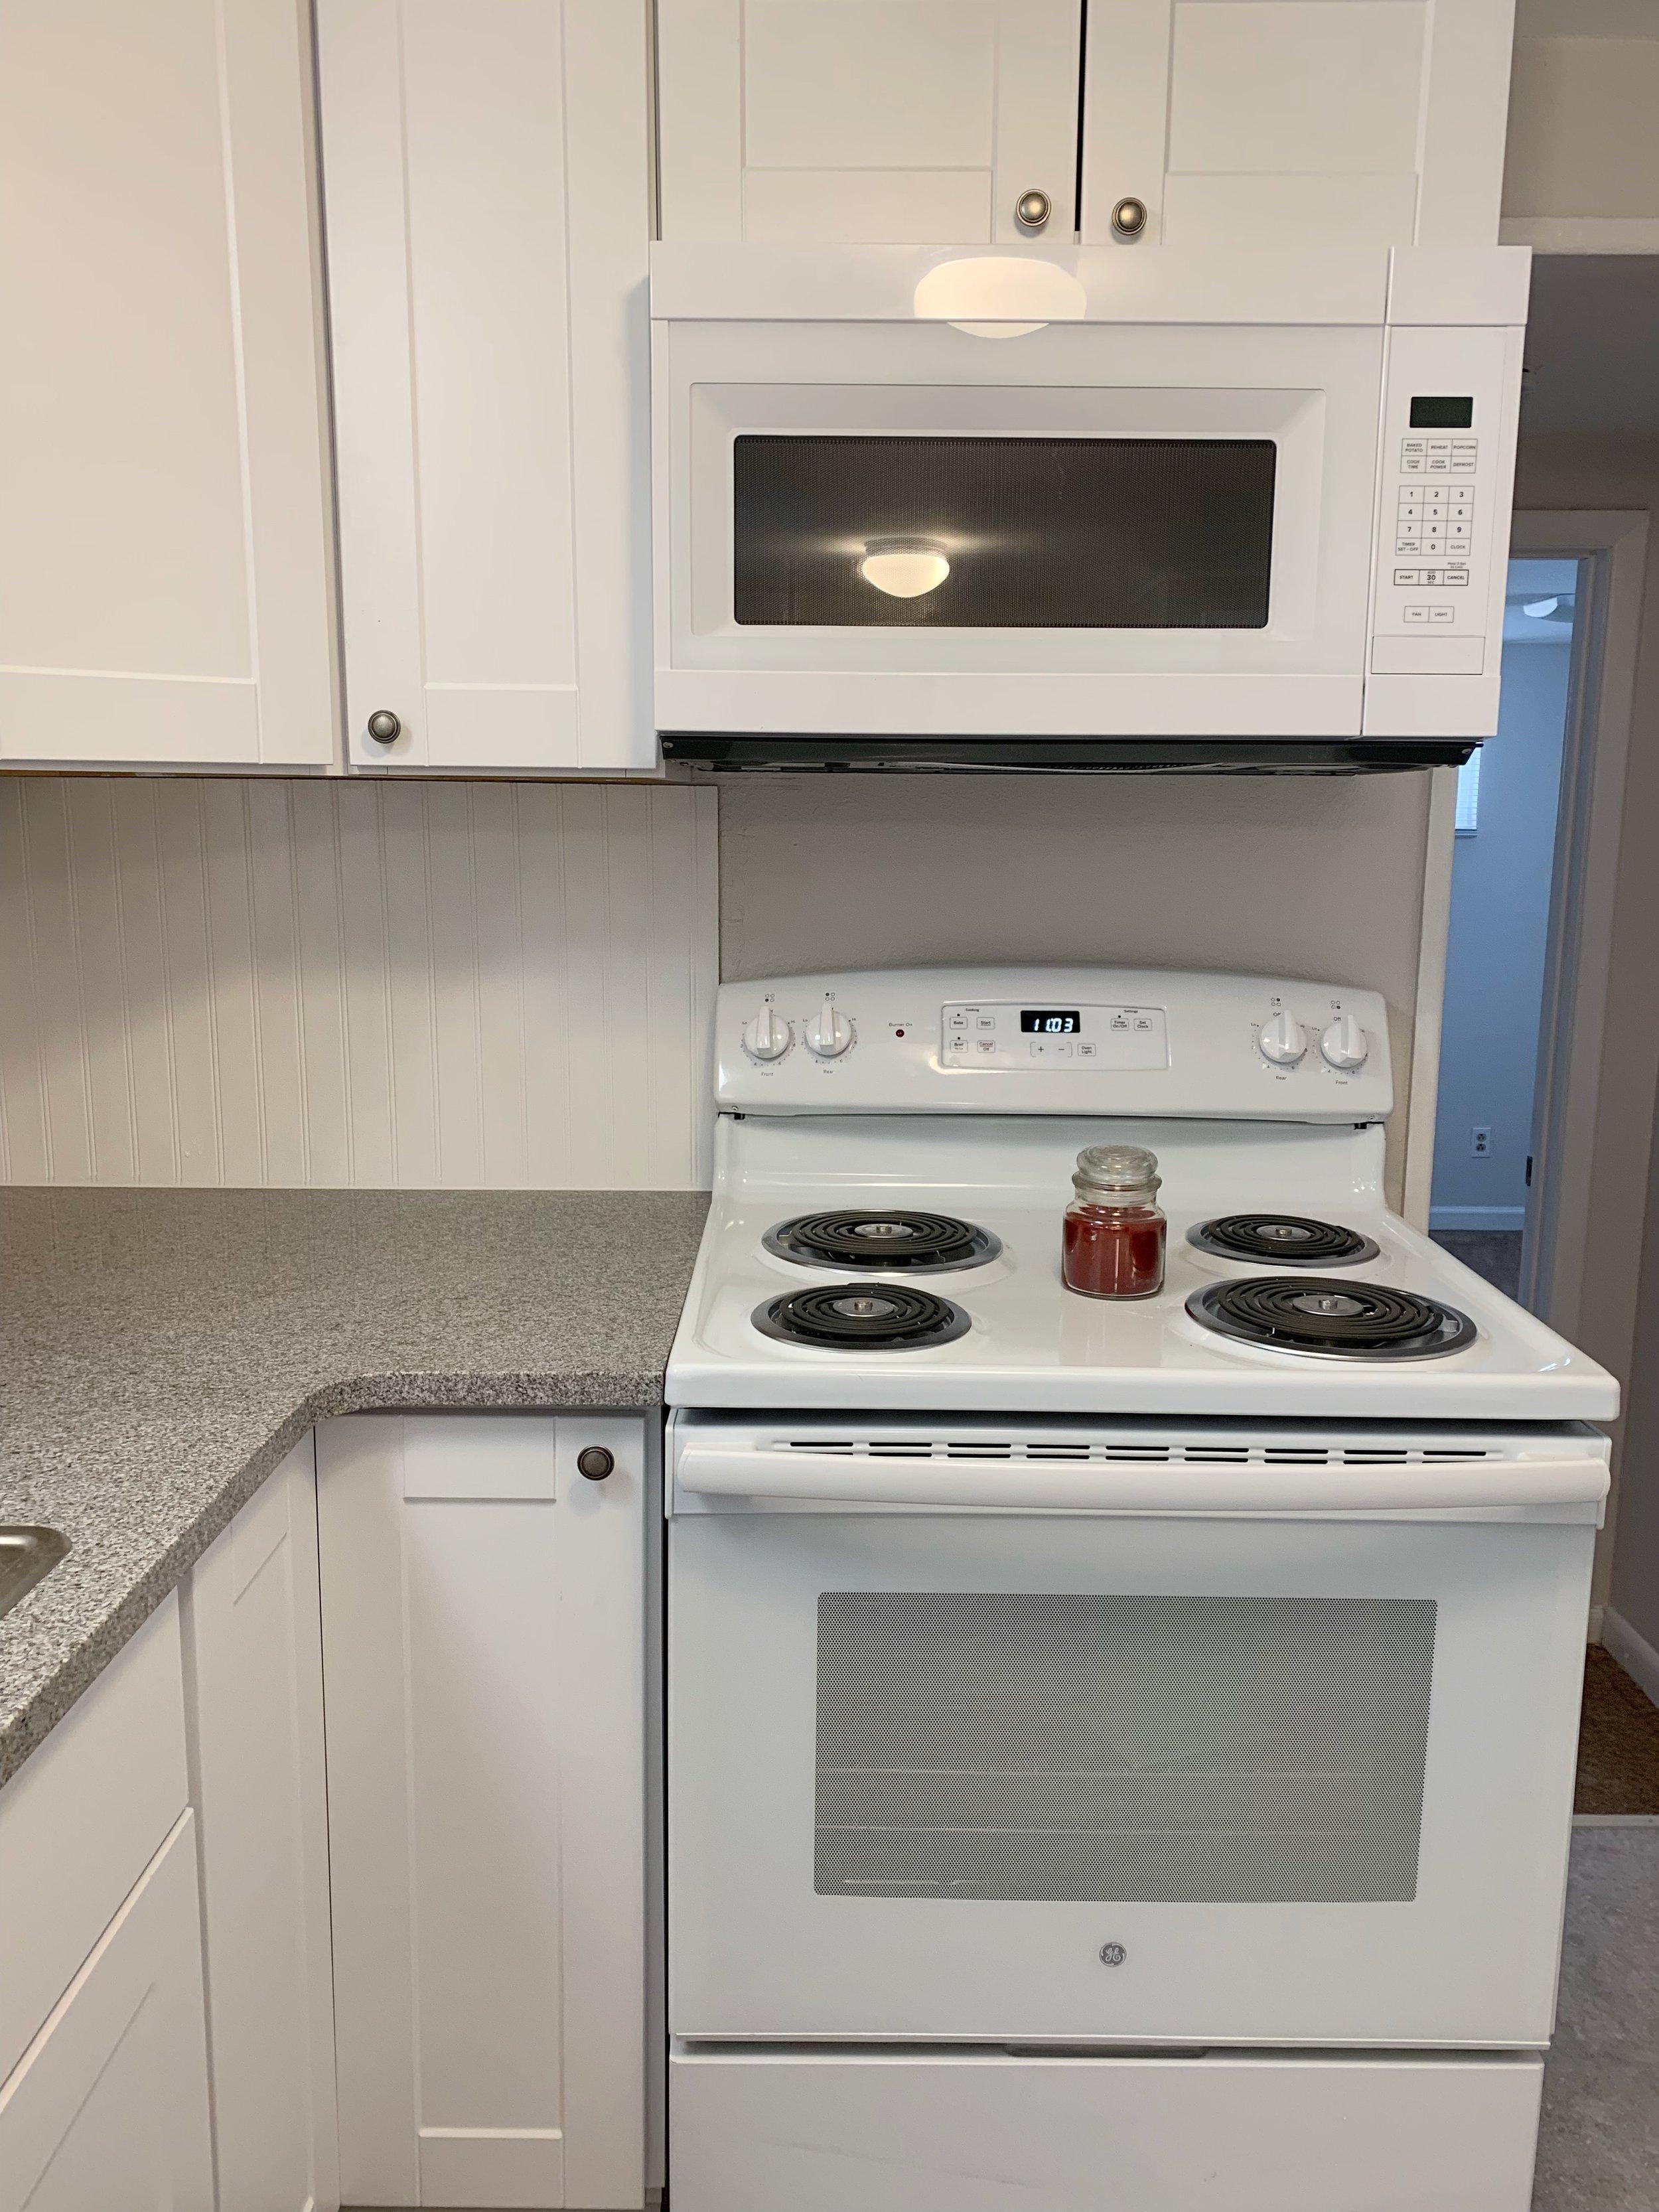 New appliances, granite countertops and DIY bead board backsplash